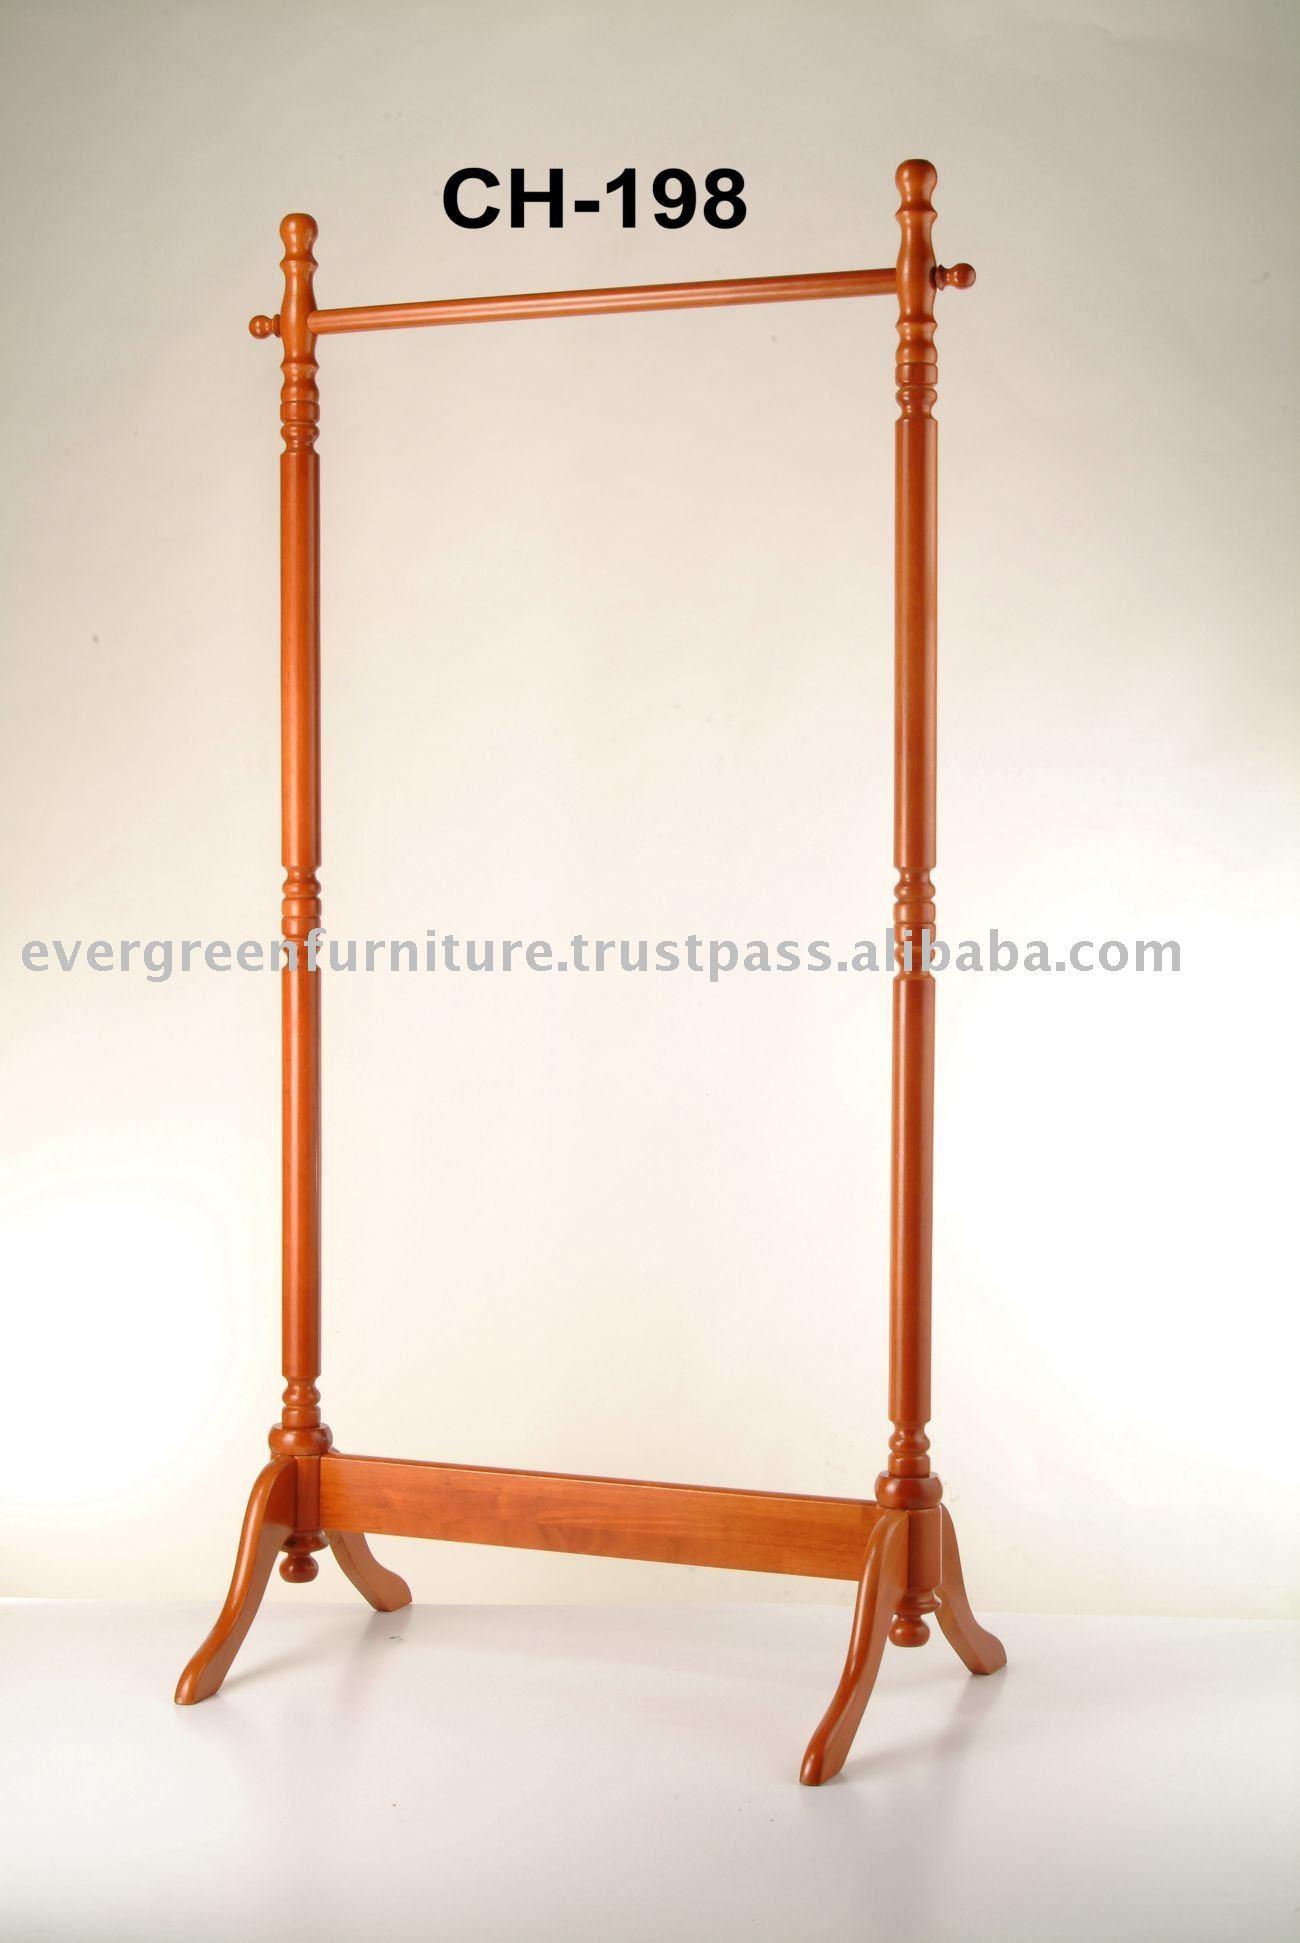 Wooden Garment Rack Buy Garment Display Rack Wooden Clothes